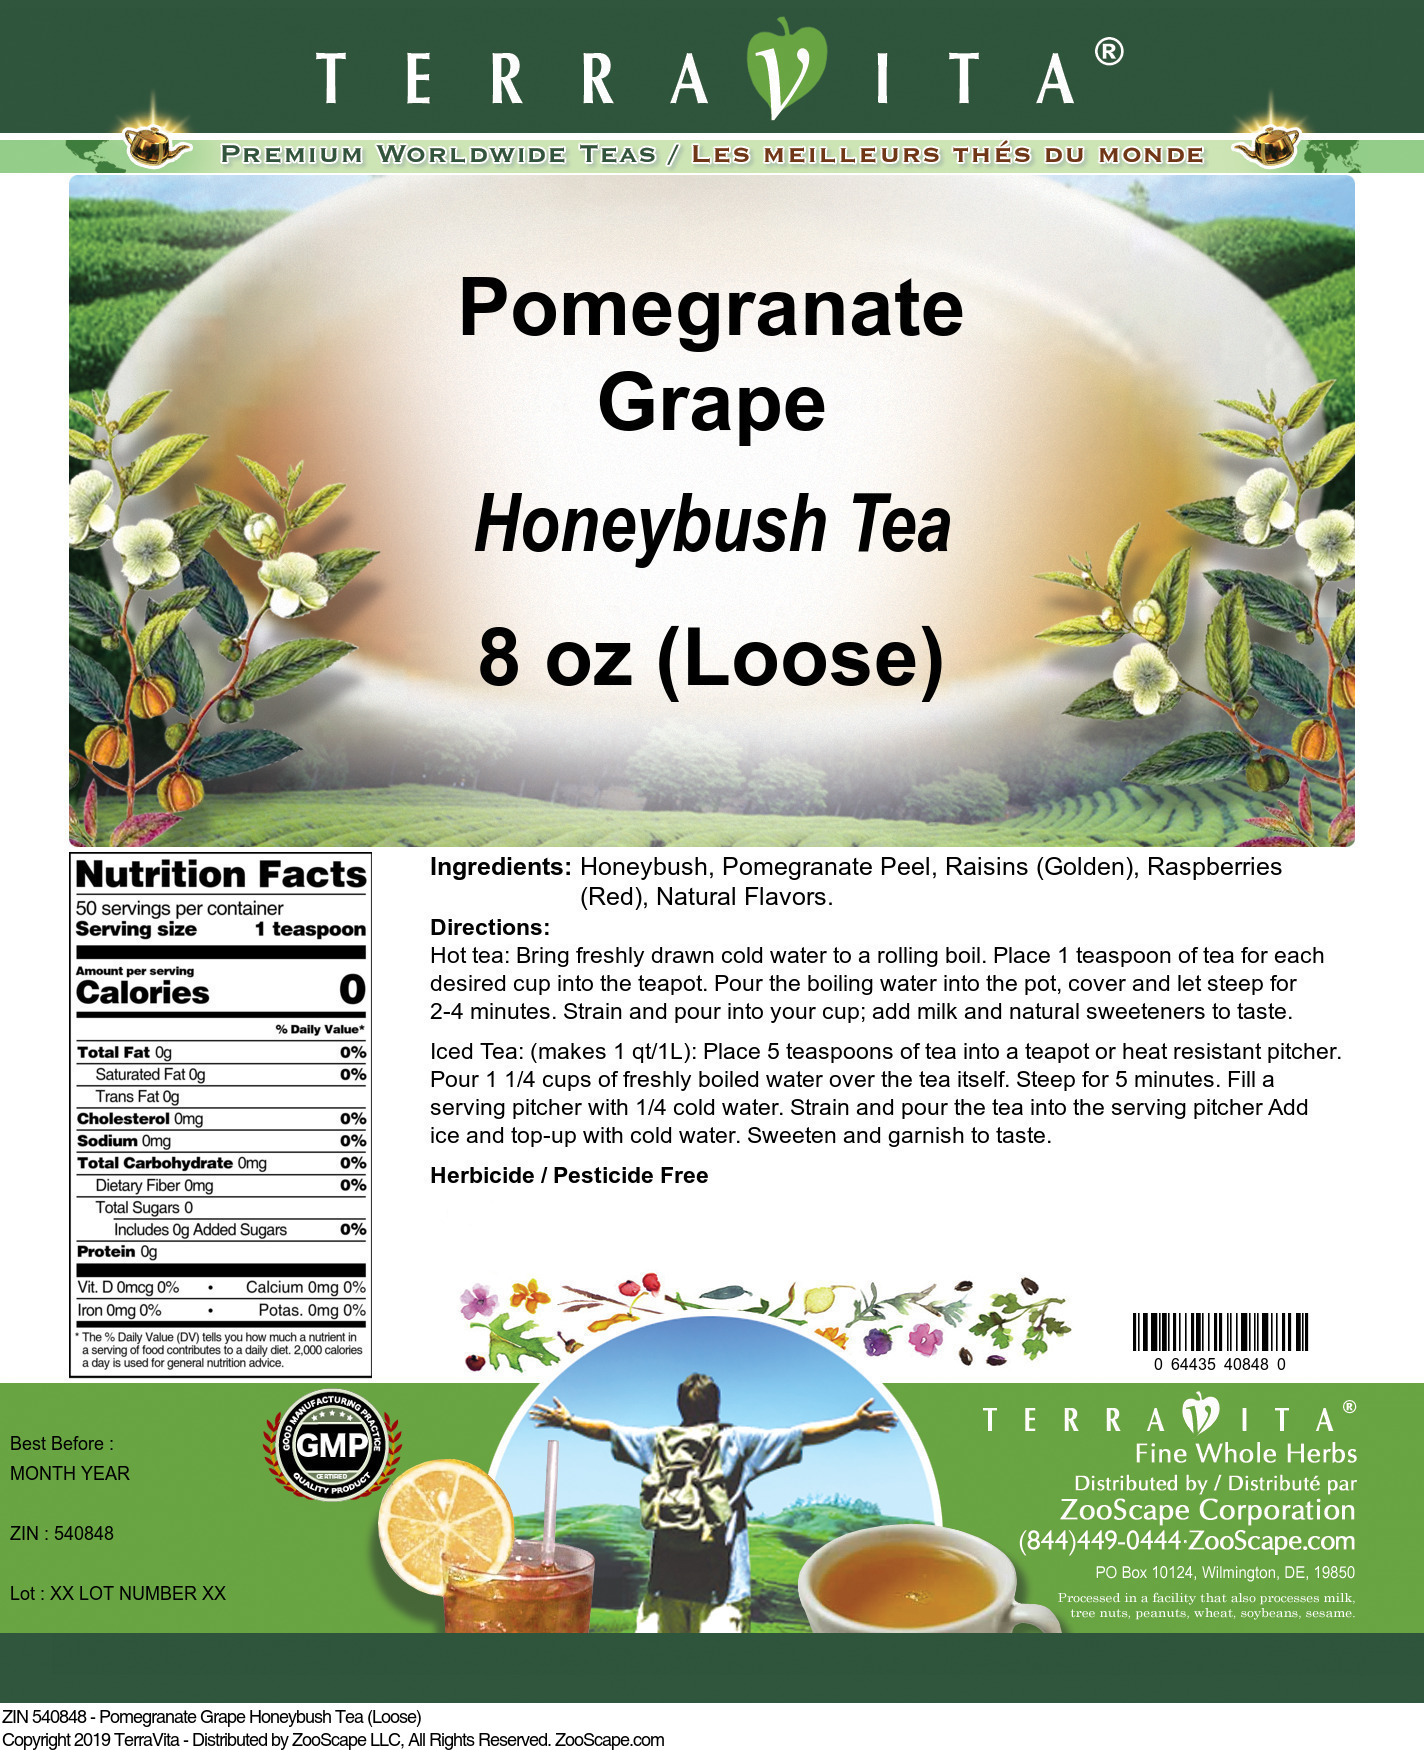 Pomegranate Grape Honeybush Tea